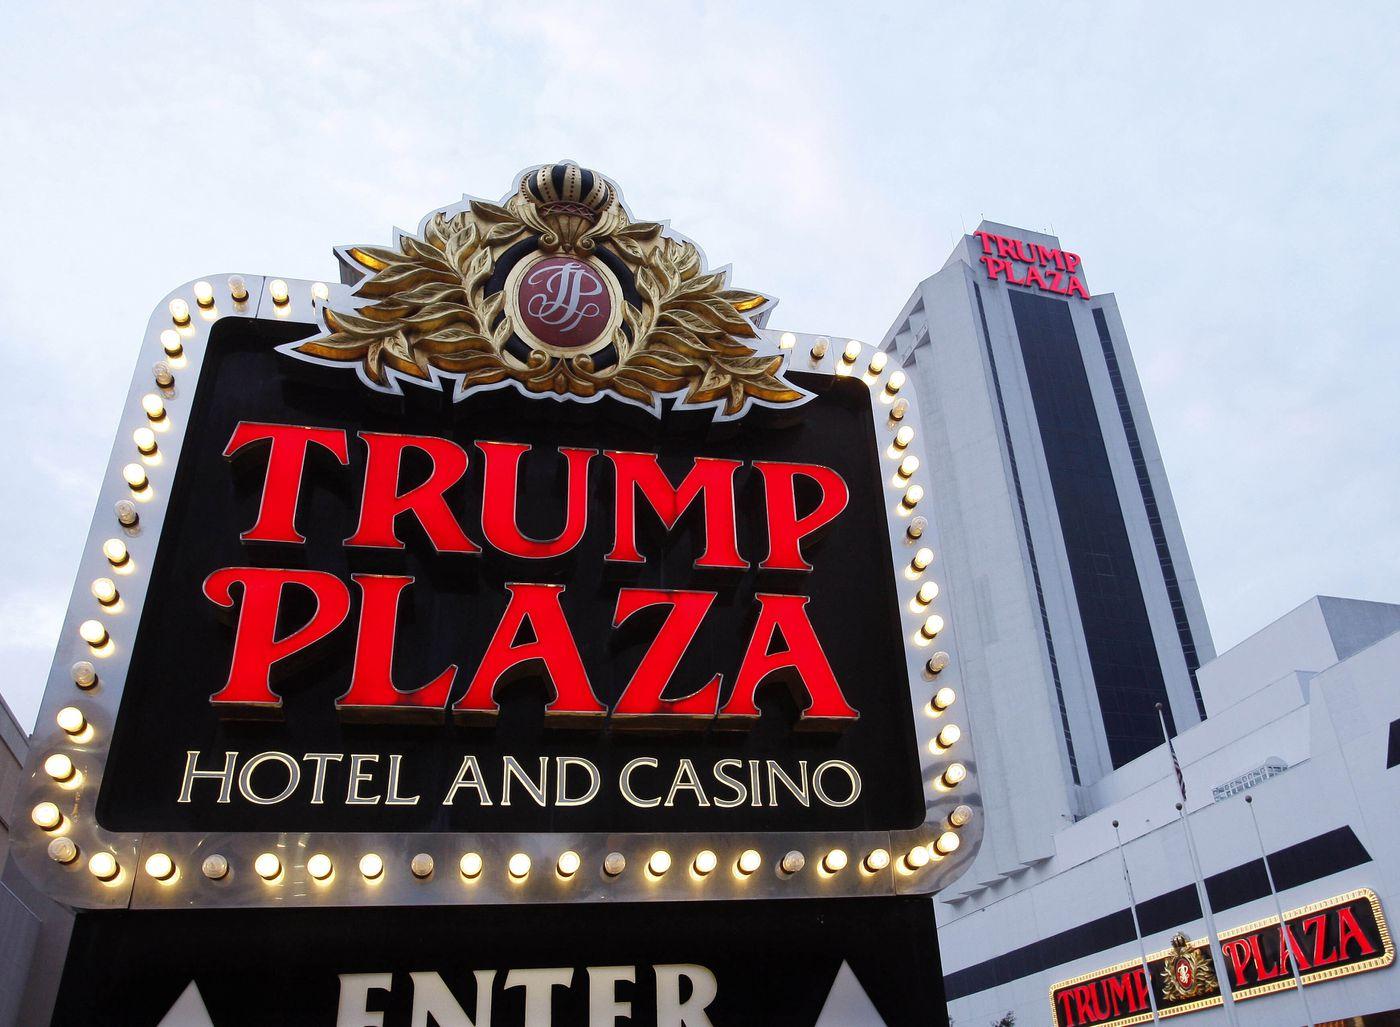 This 2010 file photo shows the Trump Plaza Hotel Casino in Atlantic City.